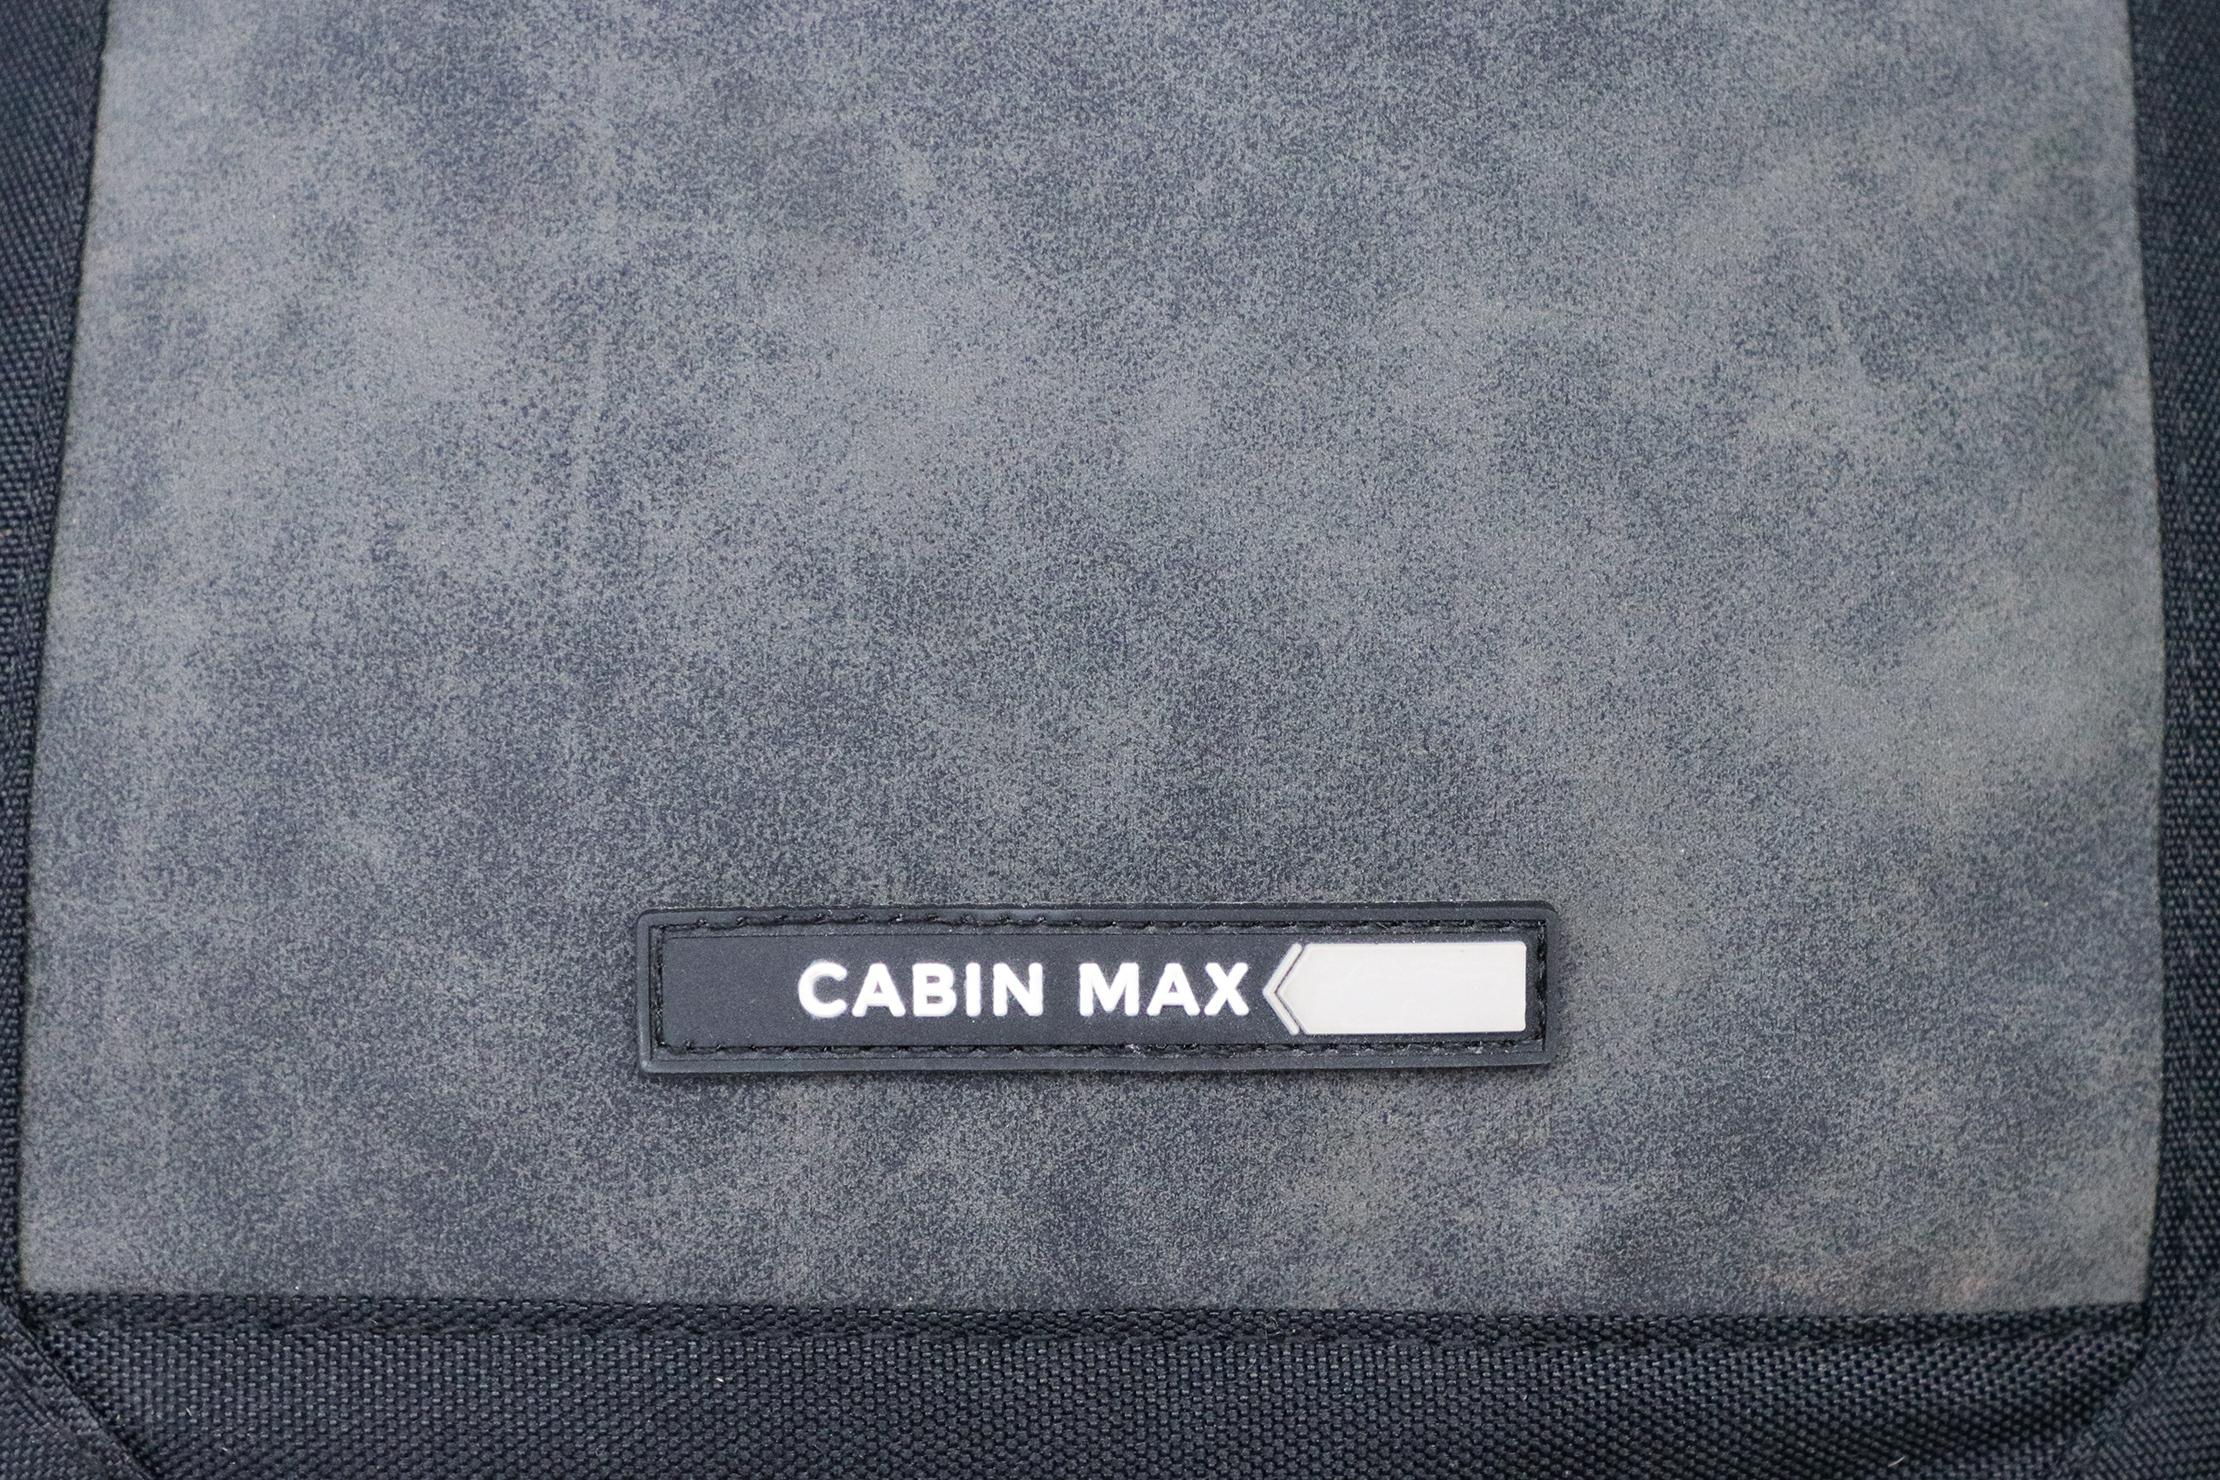 Cabin Max Manhattan Stowaway XL logo and material